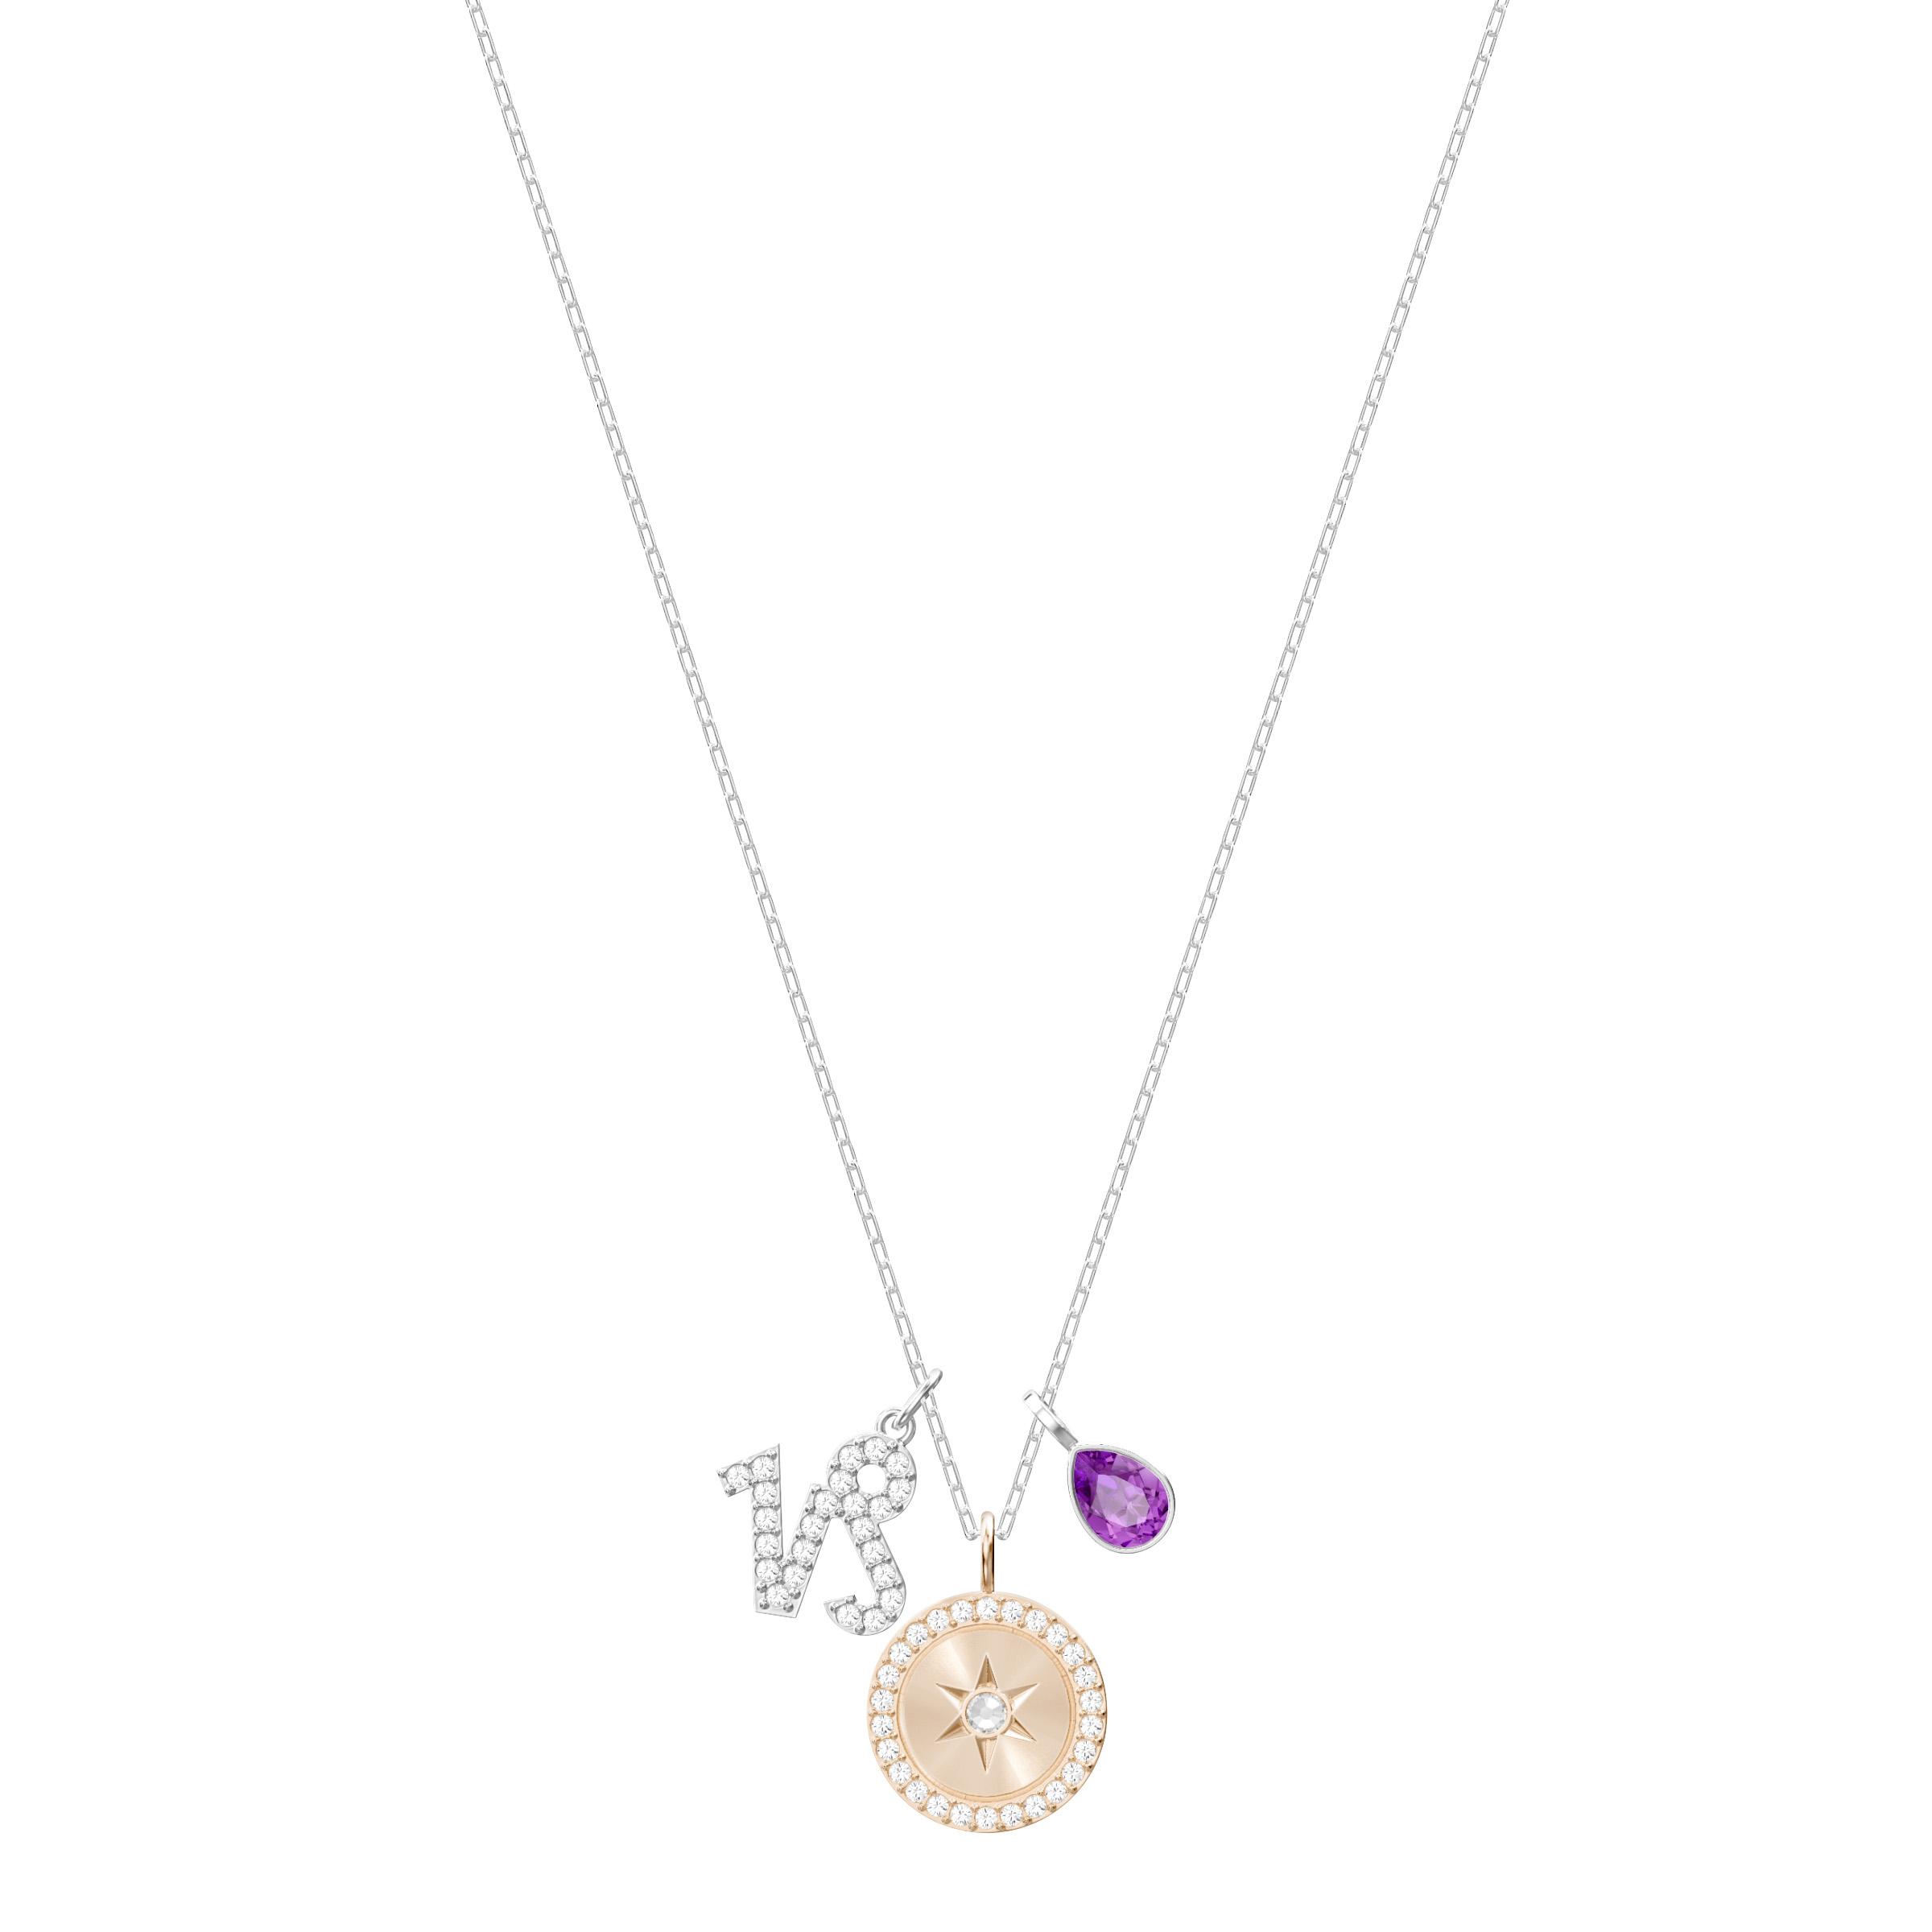 Pendentif Zodiac, Capricorne, violet, Métal rhodié Swarovski